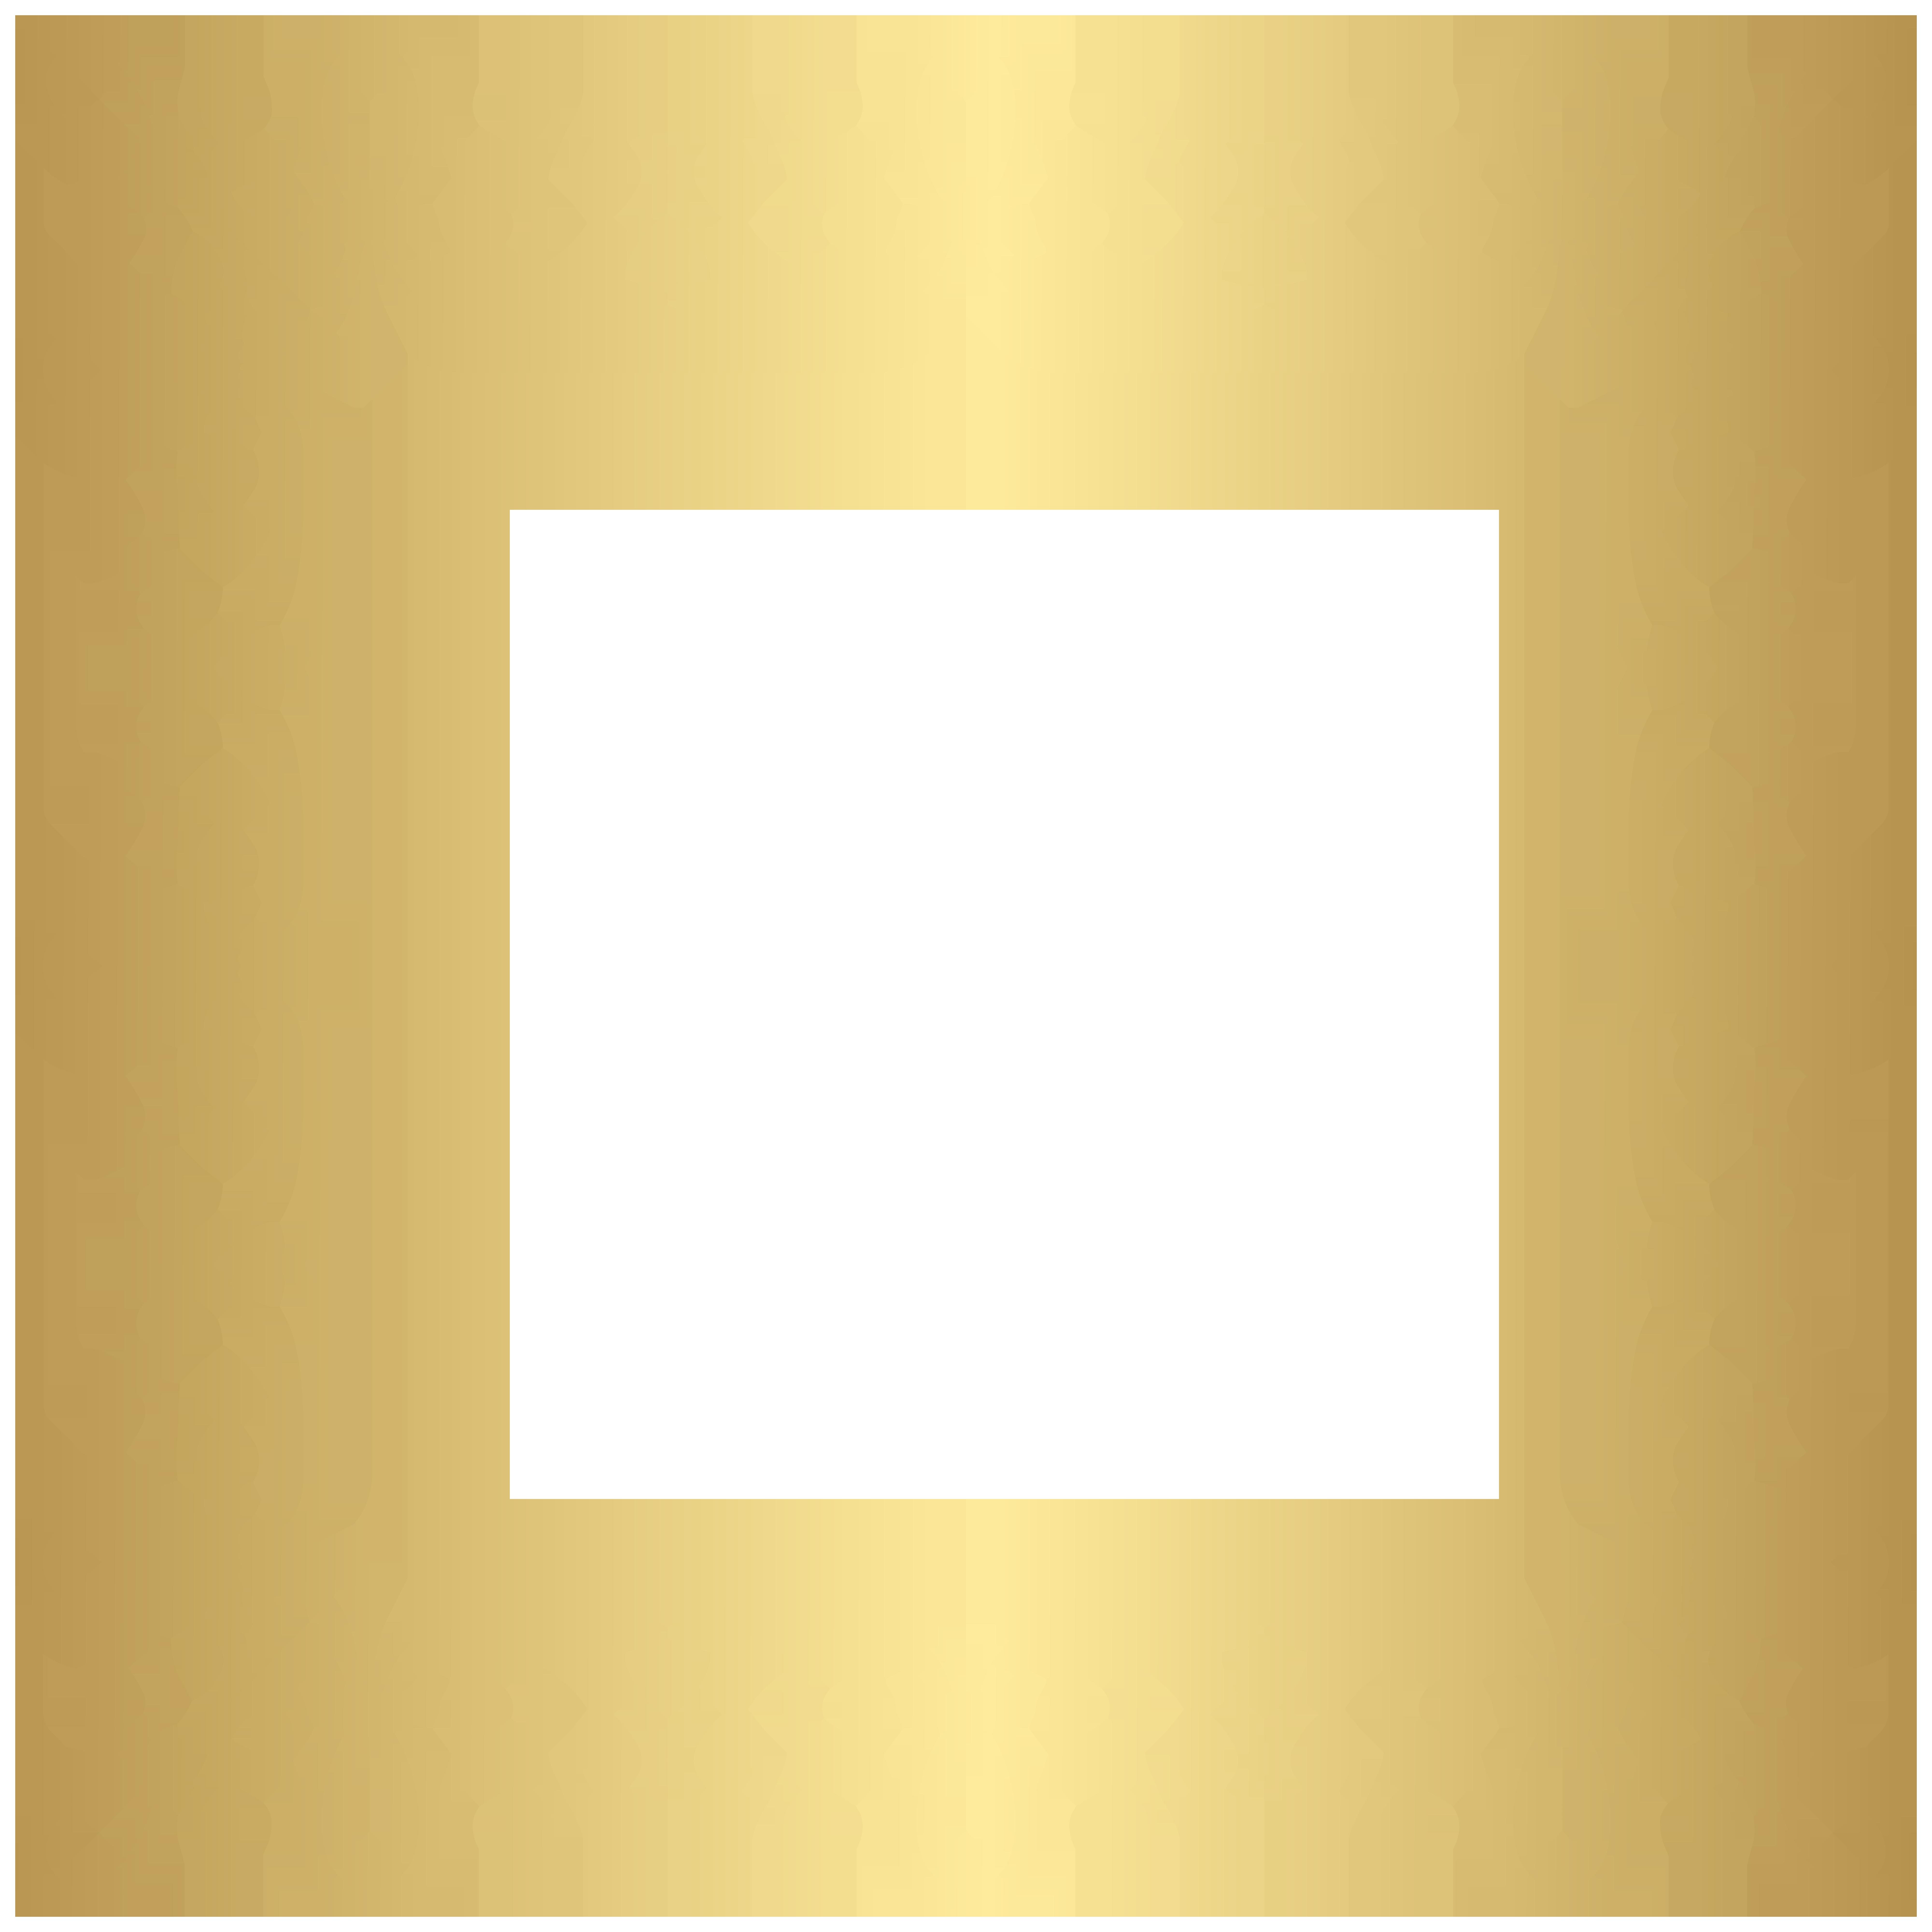 Gold Frame Border Clipart Image.